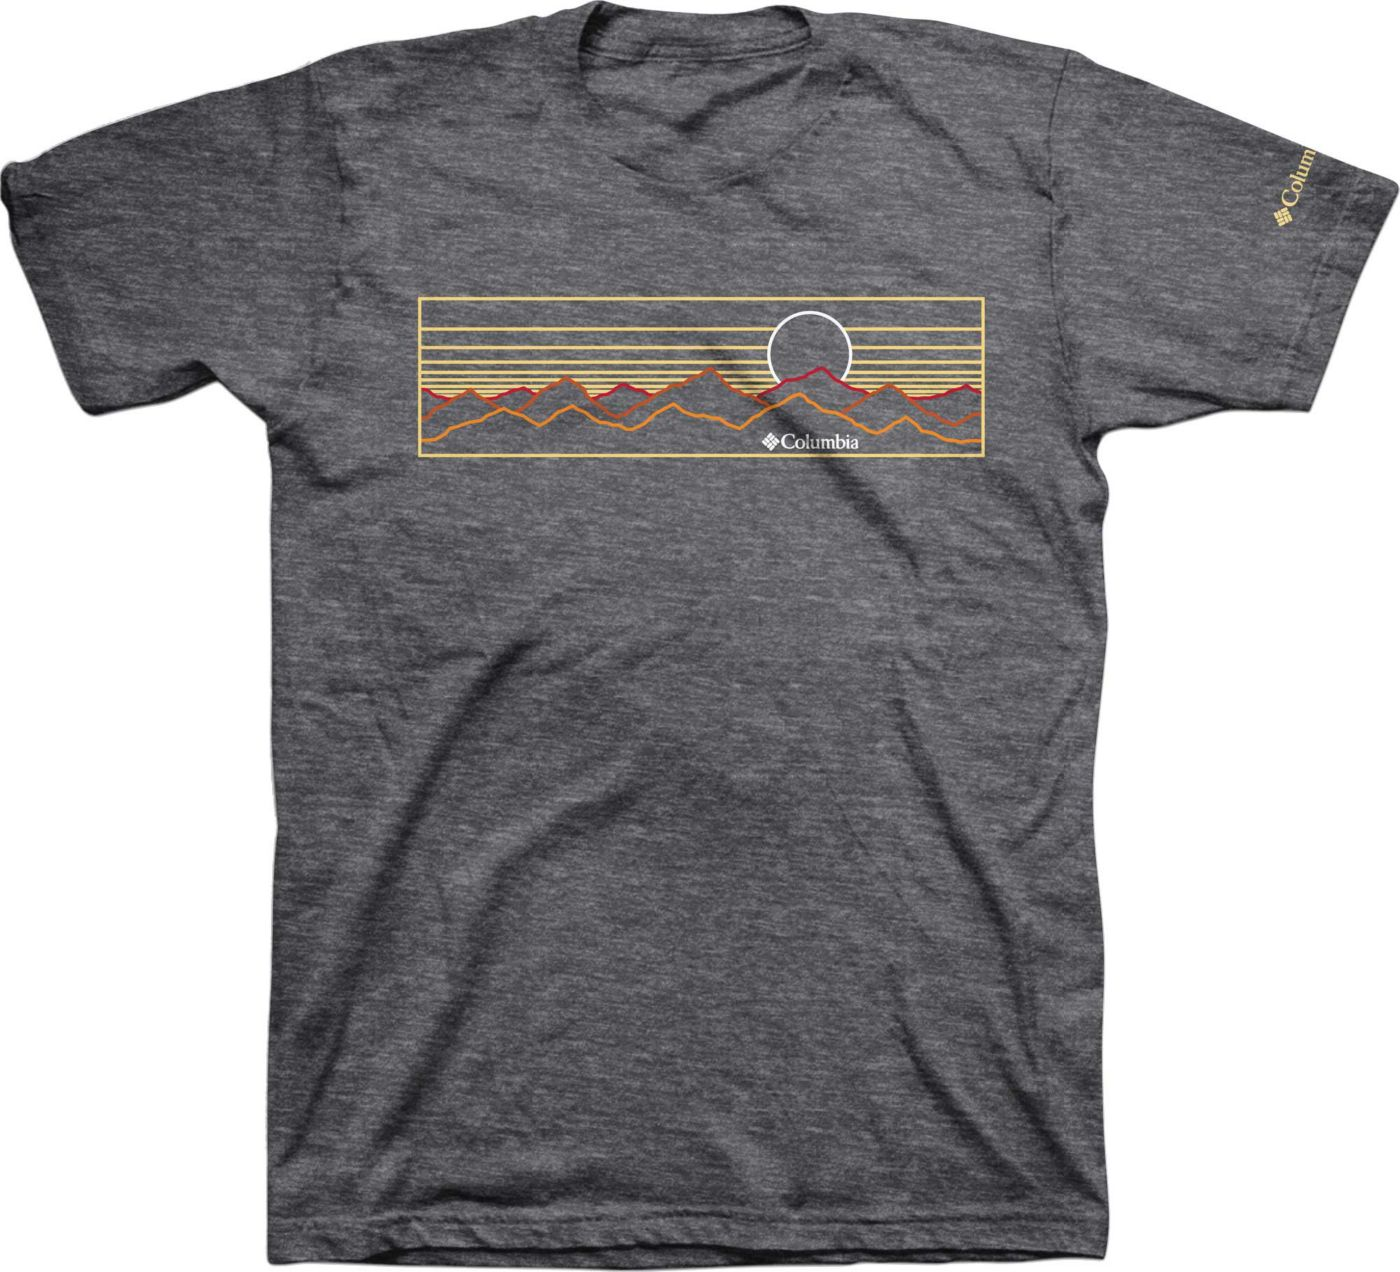 Columbia Men's Mountain Sunrise Short Sleeve T-Shirt